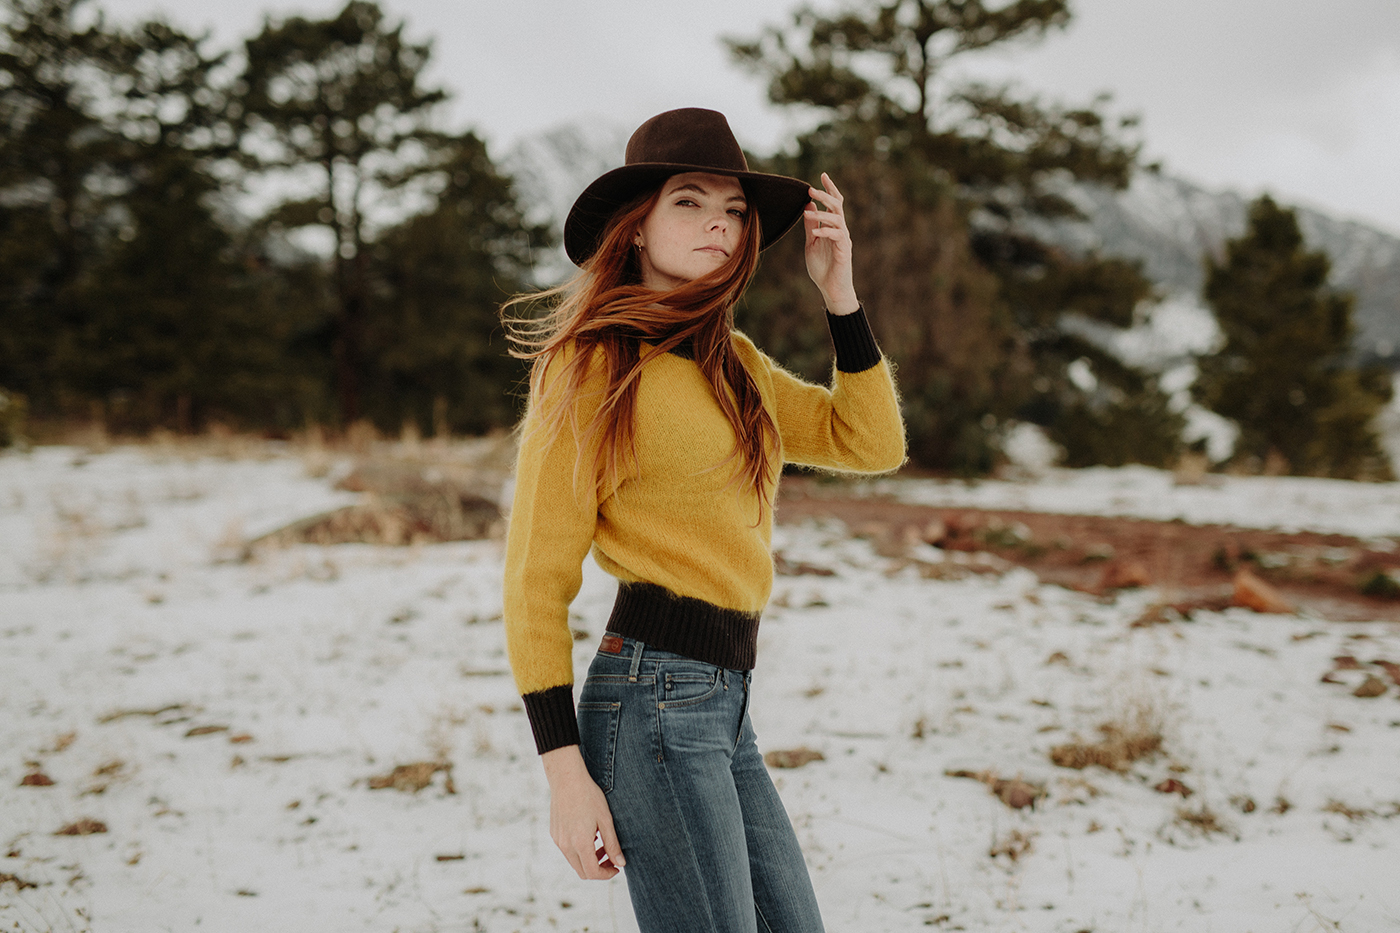 boulder-colorado-winter-snowy-trail-portrait-photographer-00005.jpg